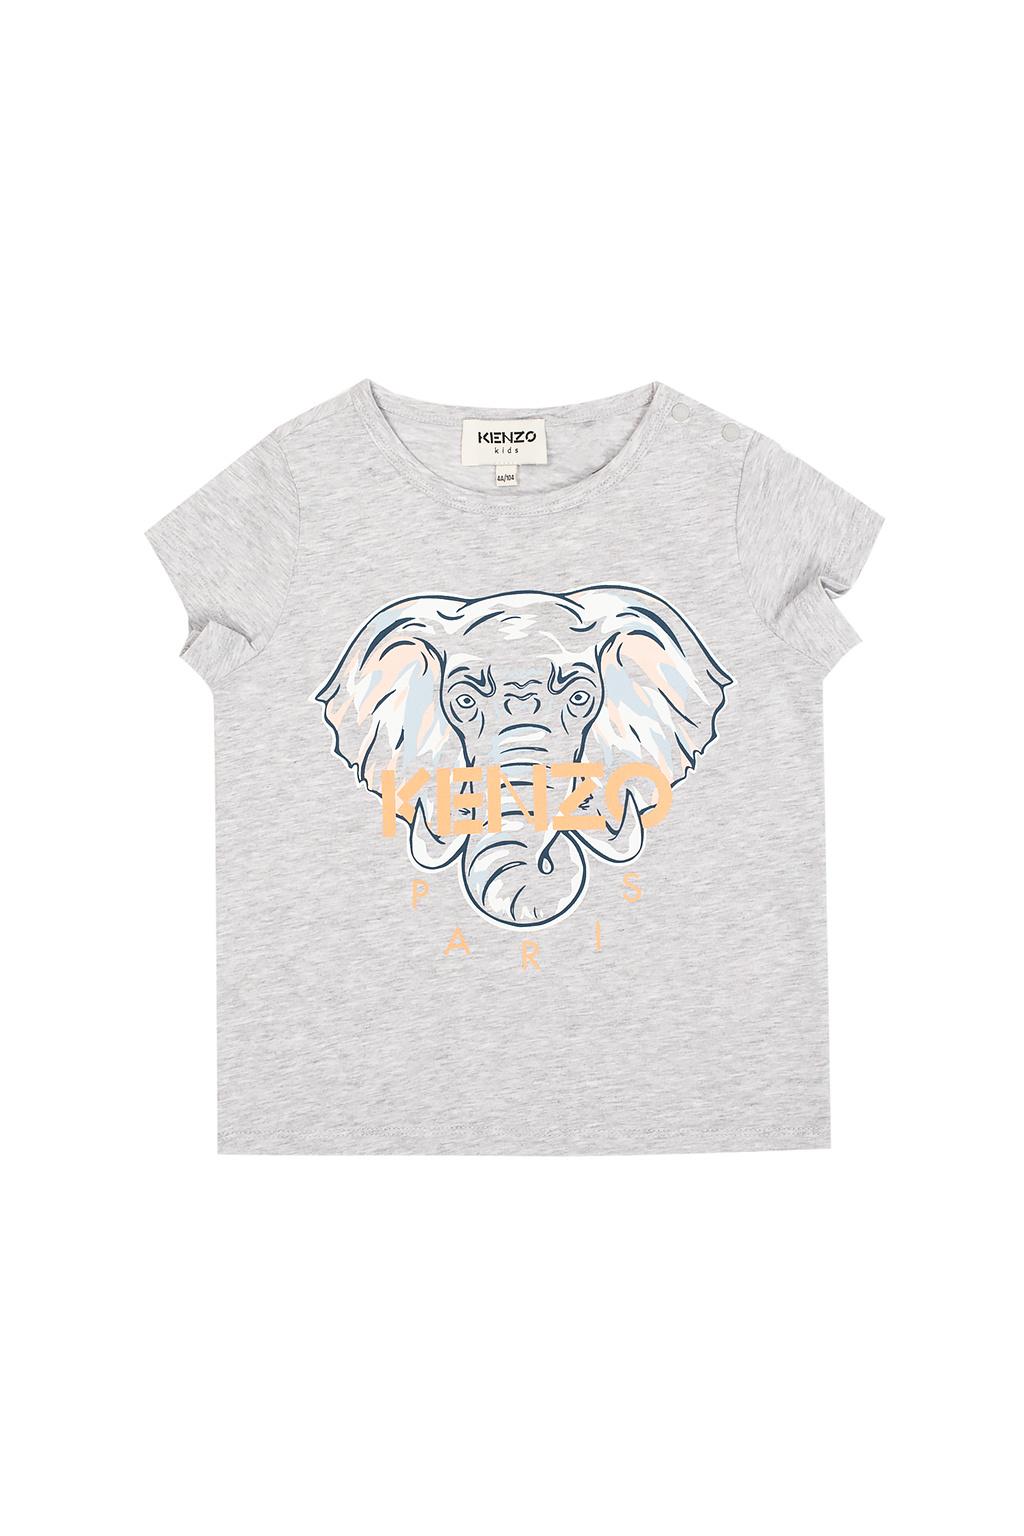 Kenzo Kids Printed T-shirt